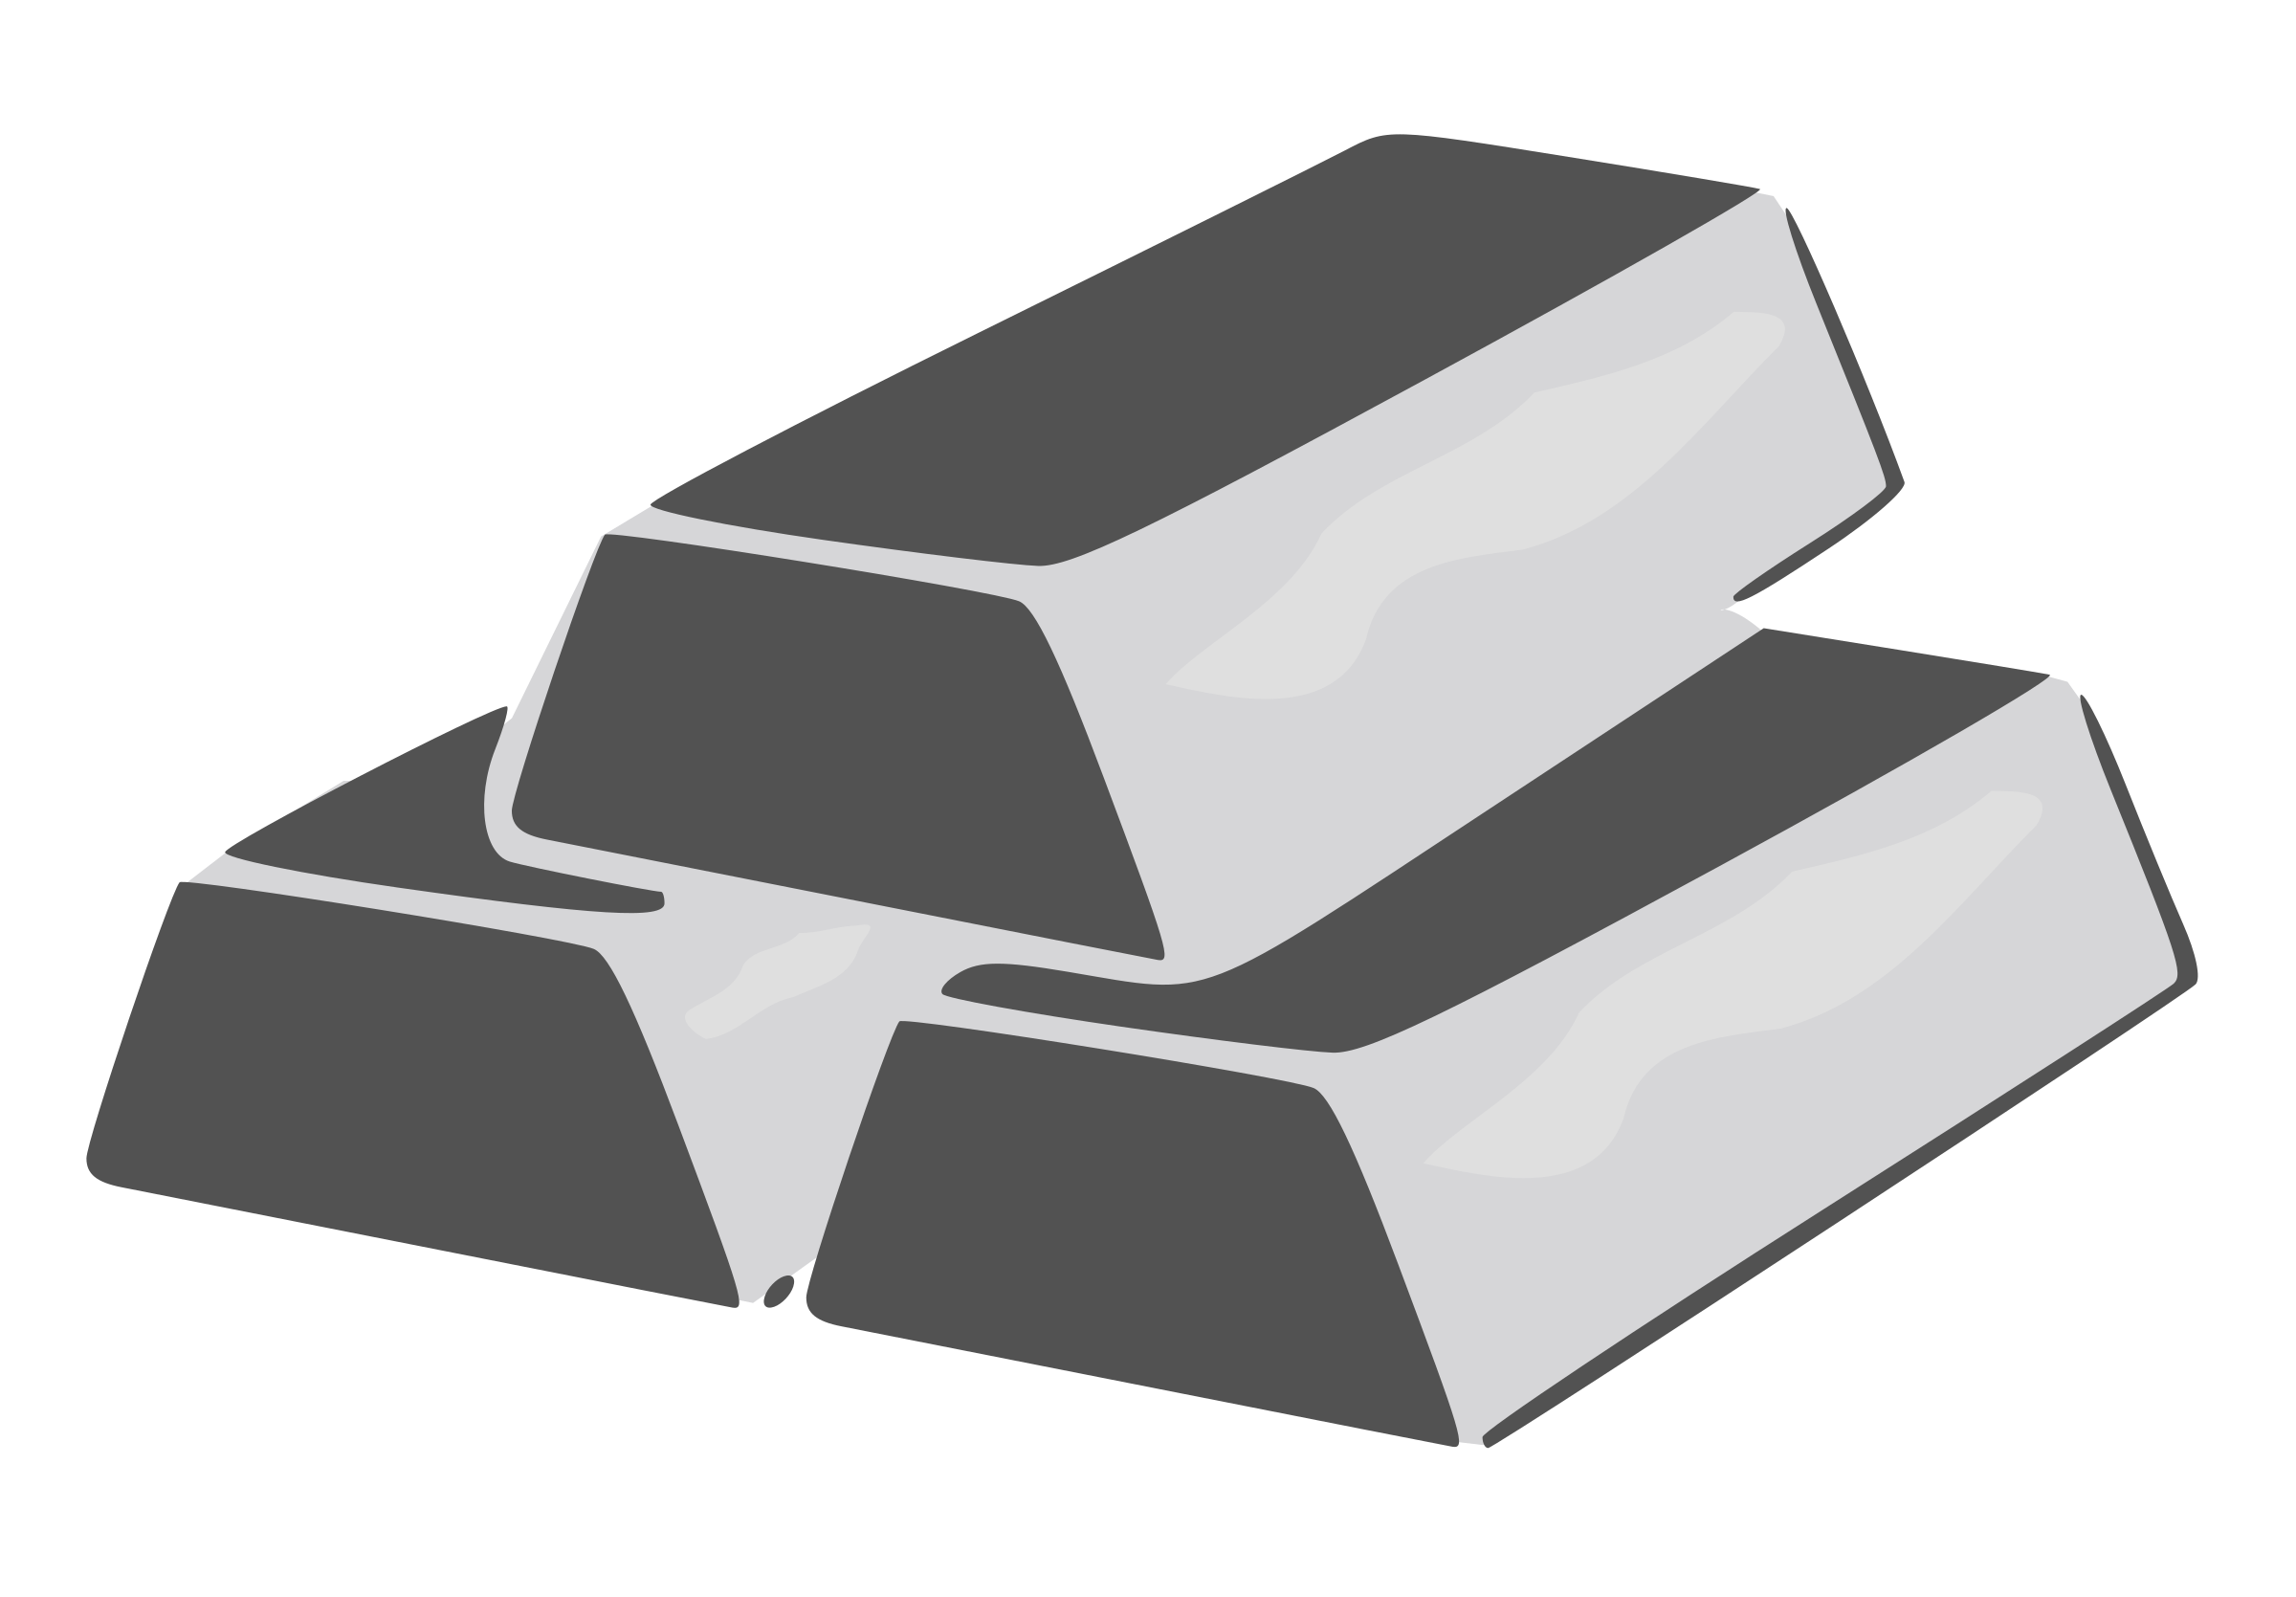 Silver bricks big image. Treasure clipart valuable